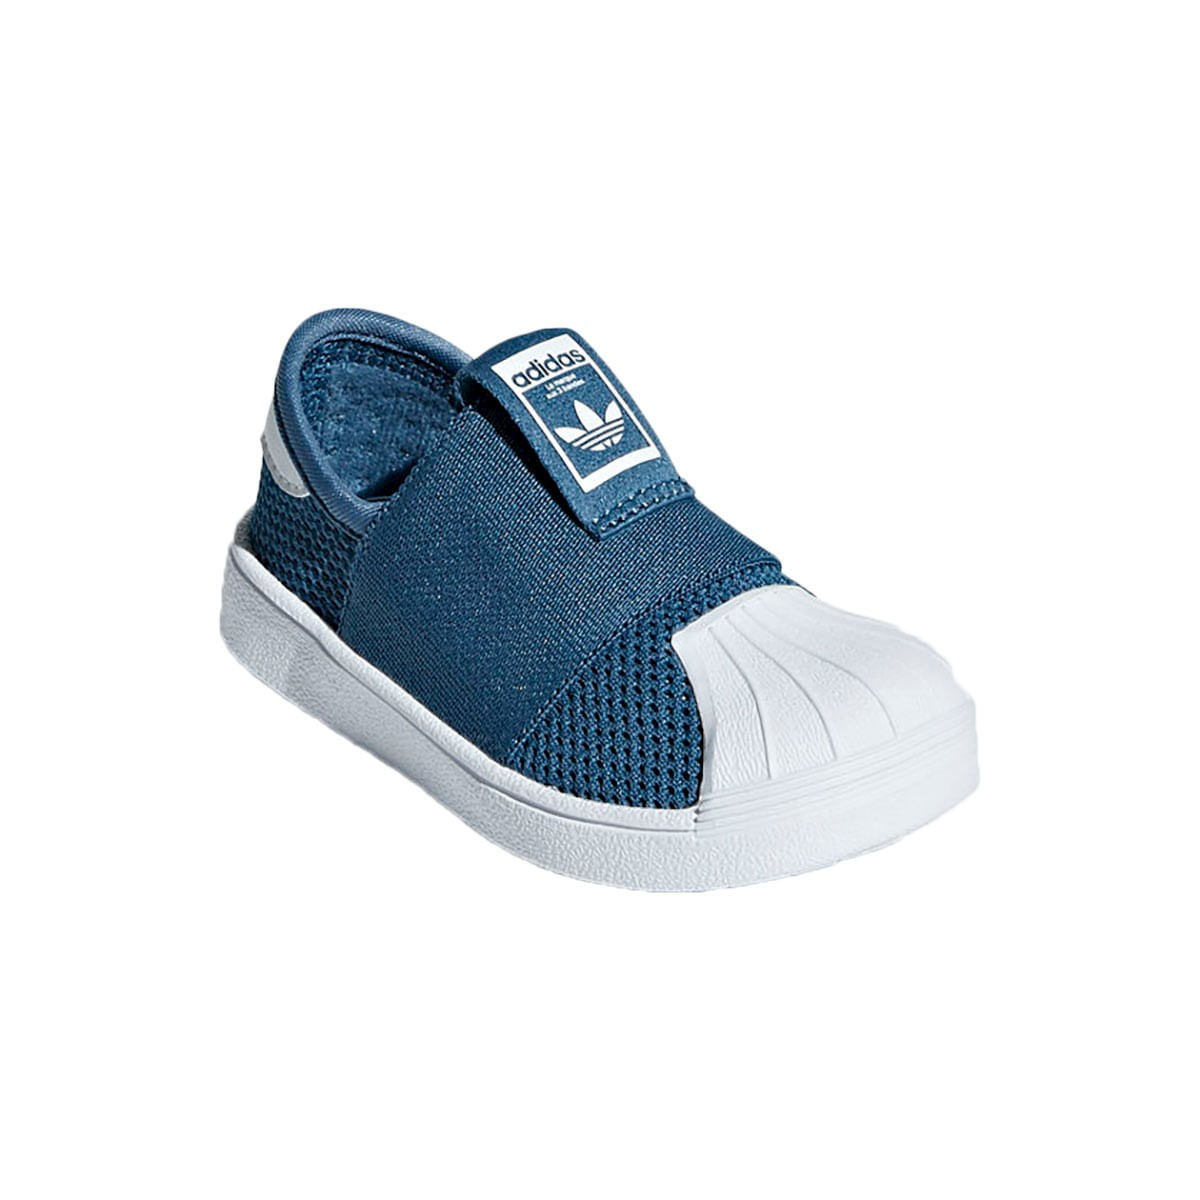 Tenis-Infantil-Adidas-SuperStar-SMR-360-I--19-ao-25-